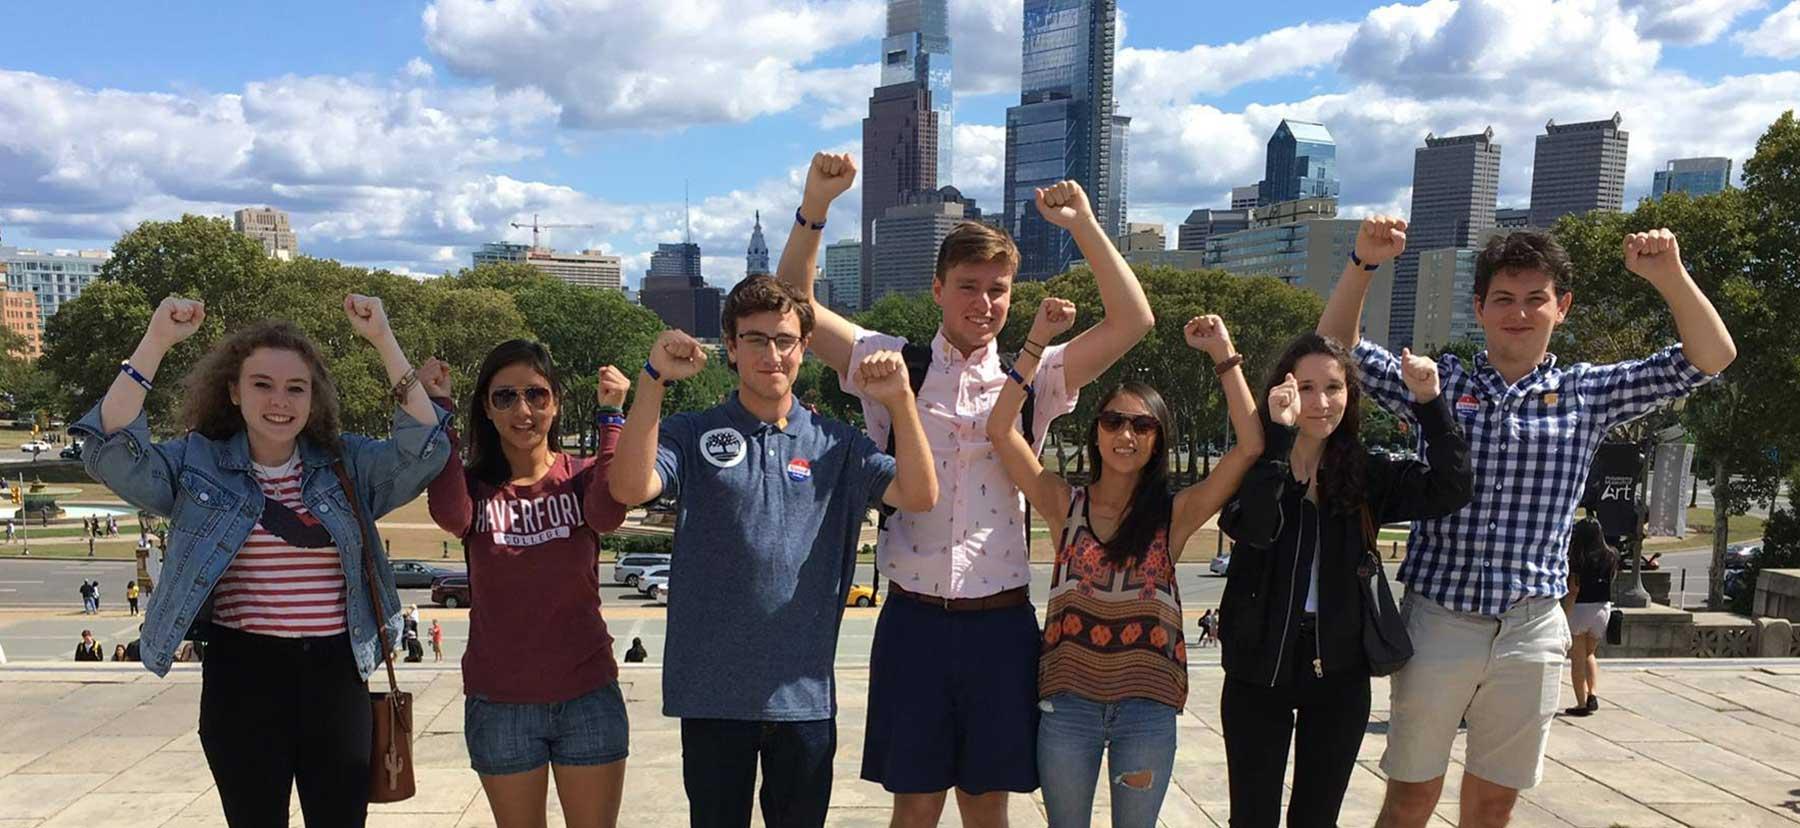 Students in Philadelphia